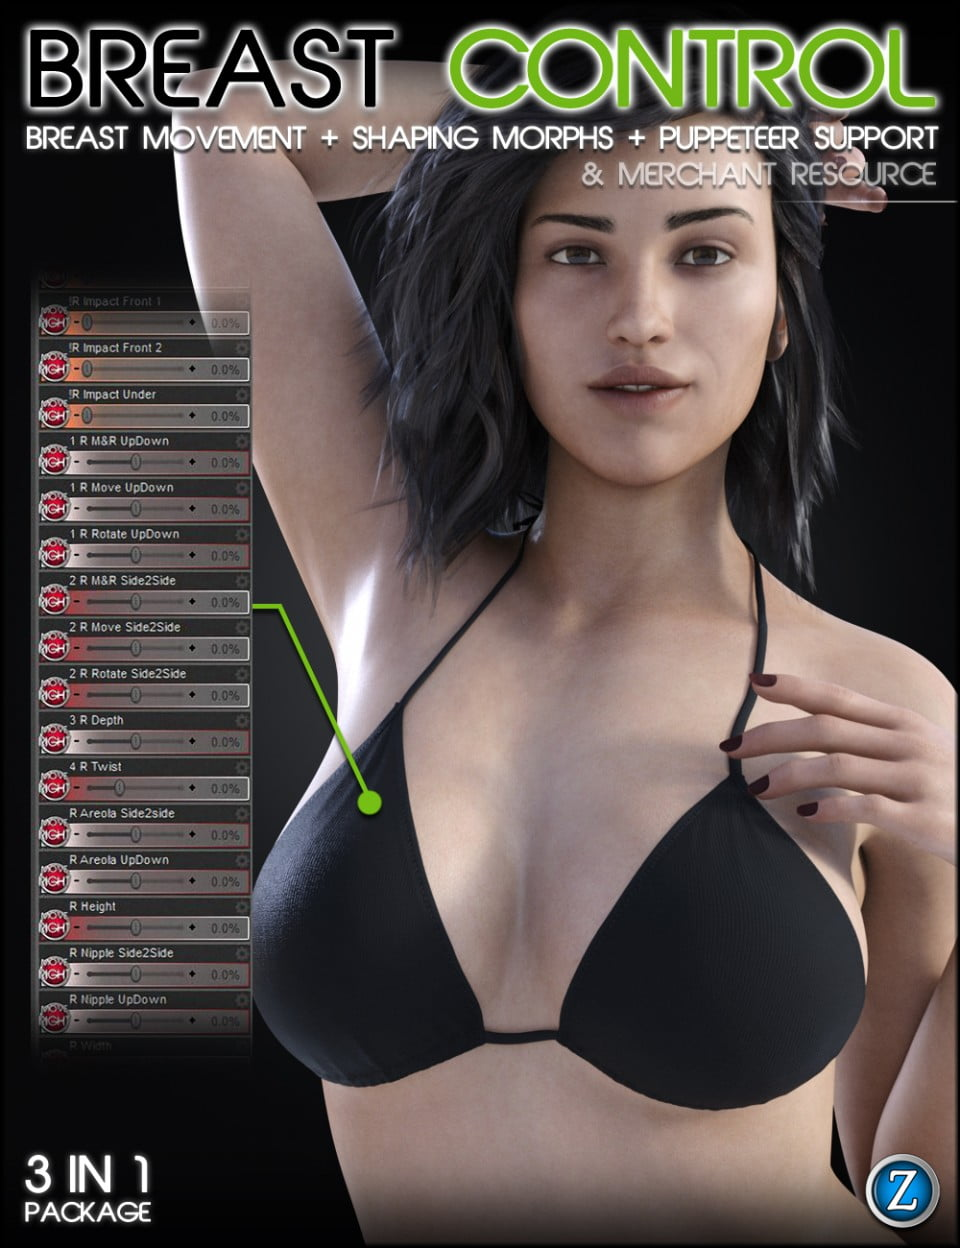 Breast Control Genesis 8 Female(s) Merchant Resource